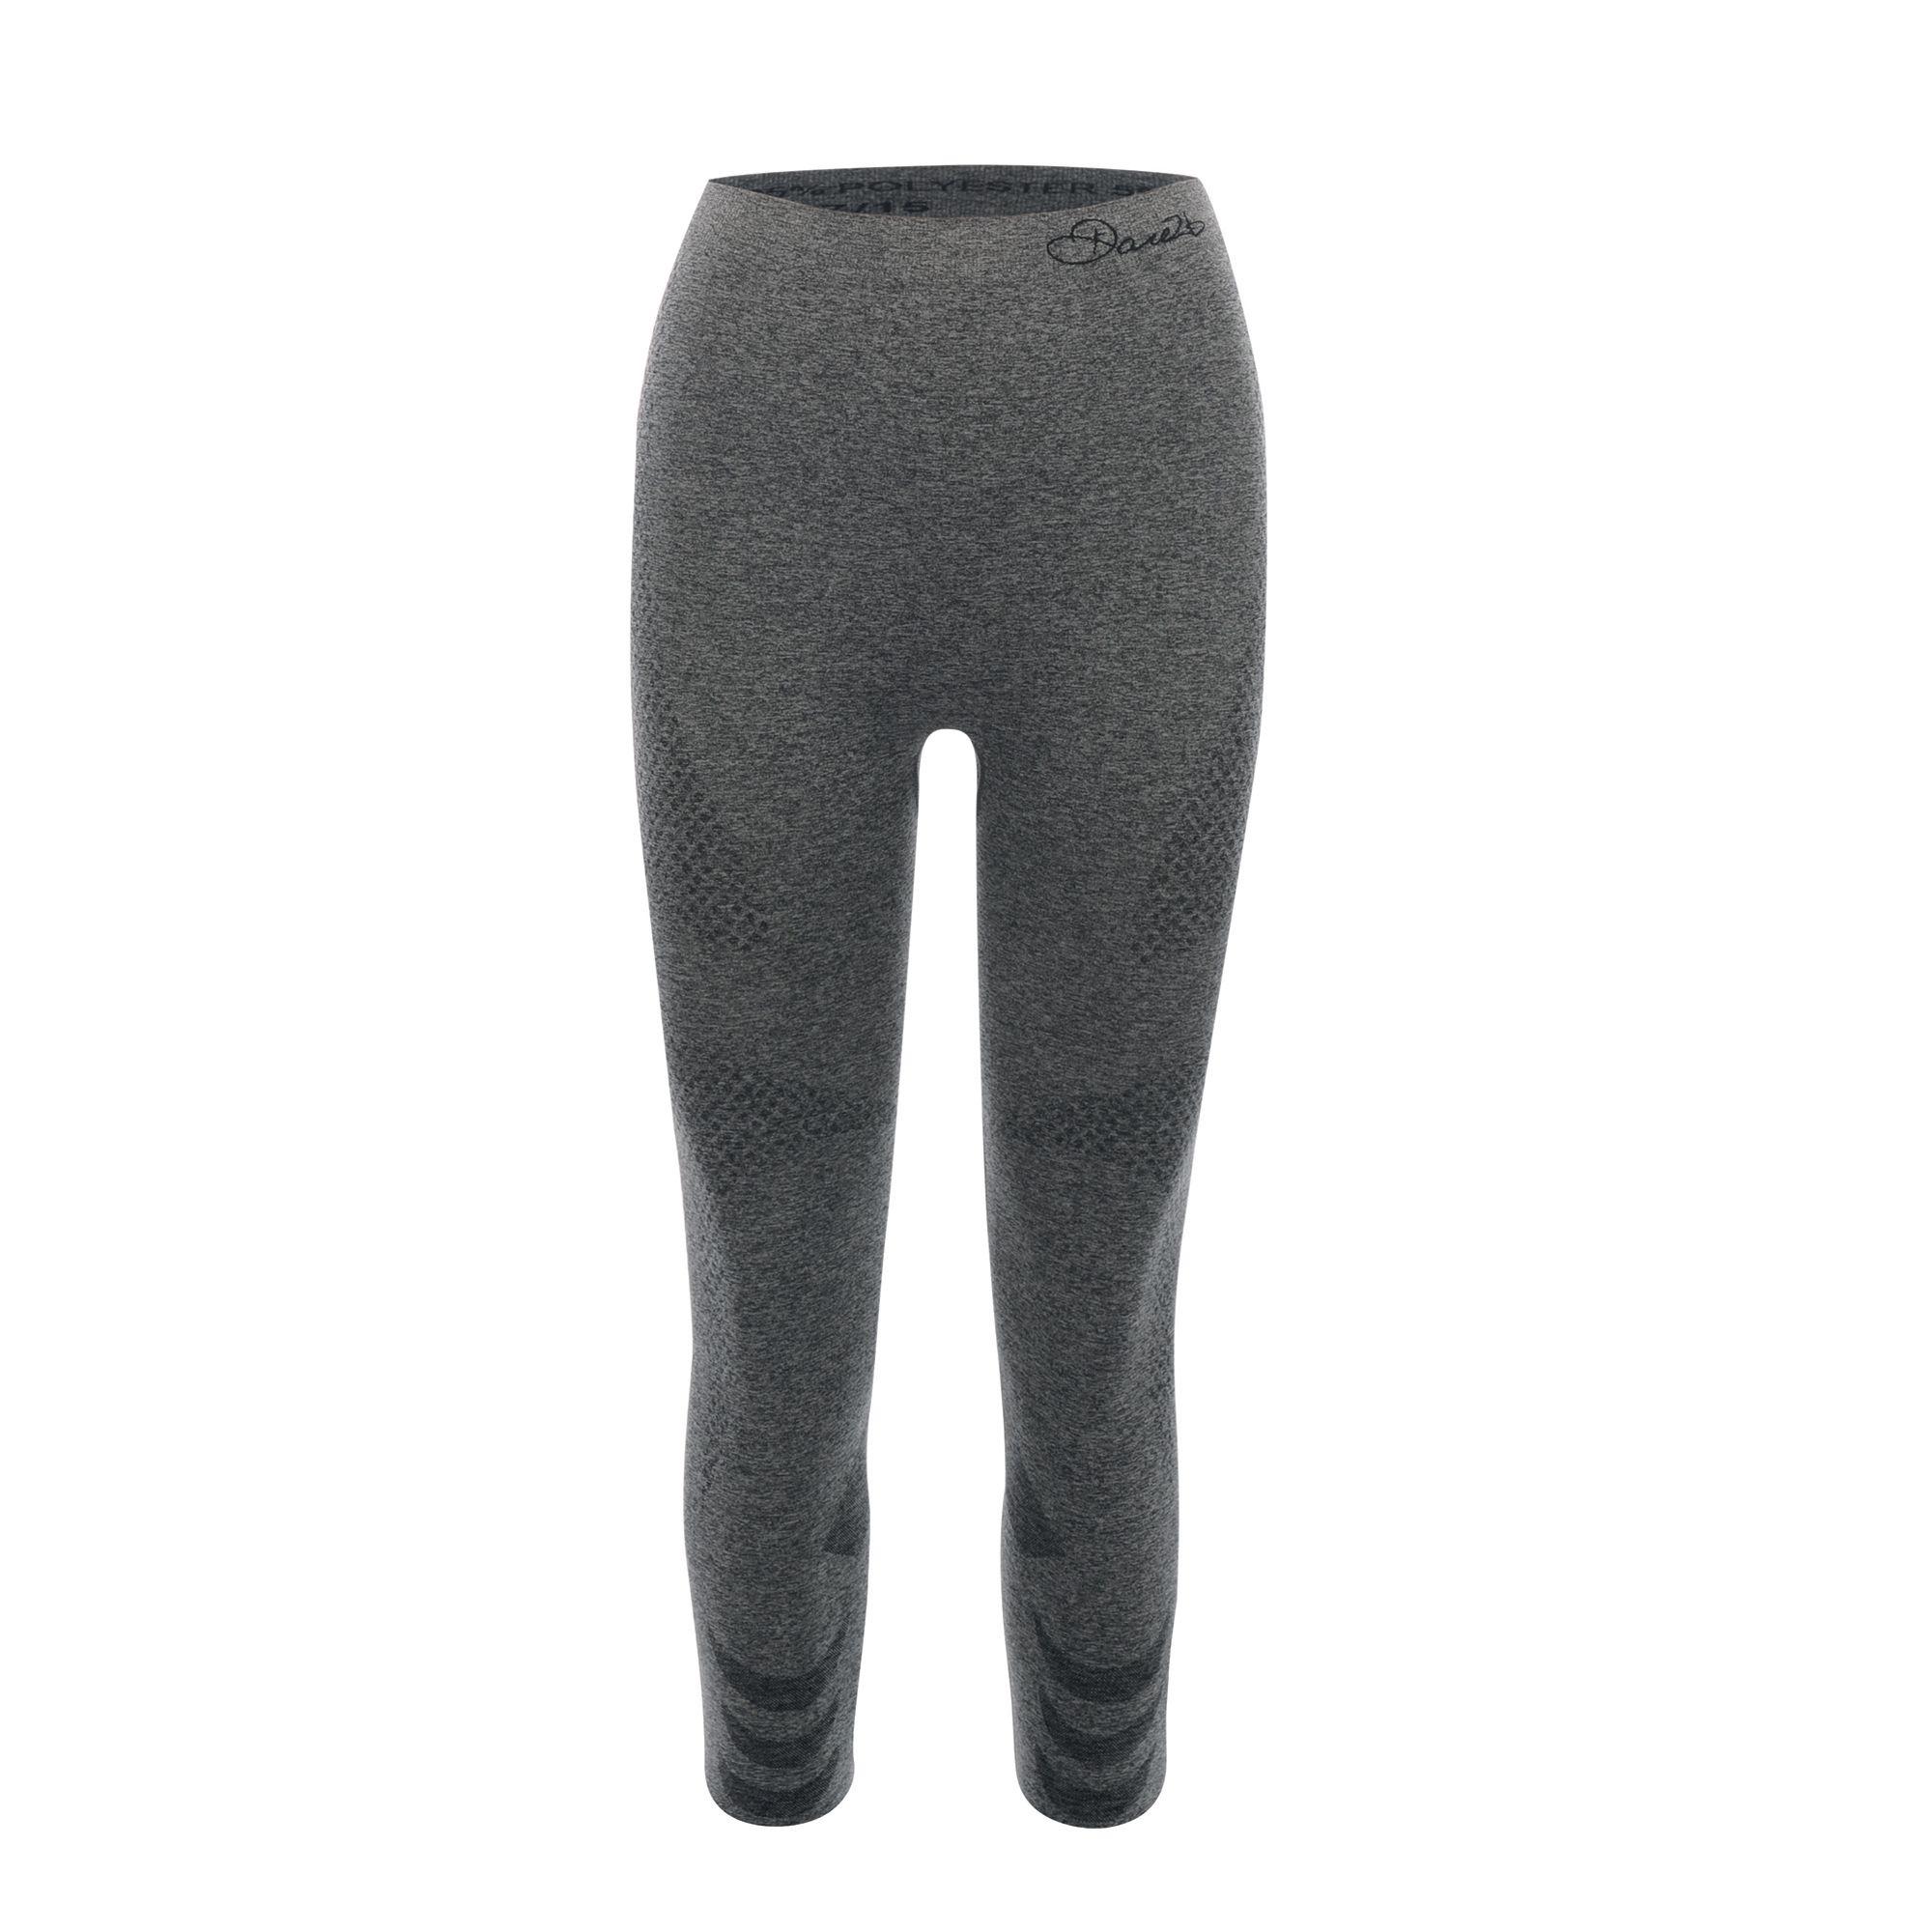 Dare 2B Womens/Ladies Zonal III 3/4 Baselayer Bottoms/Leggings